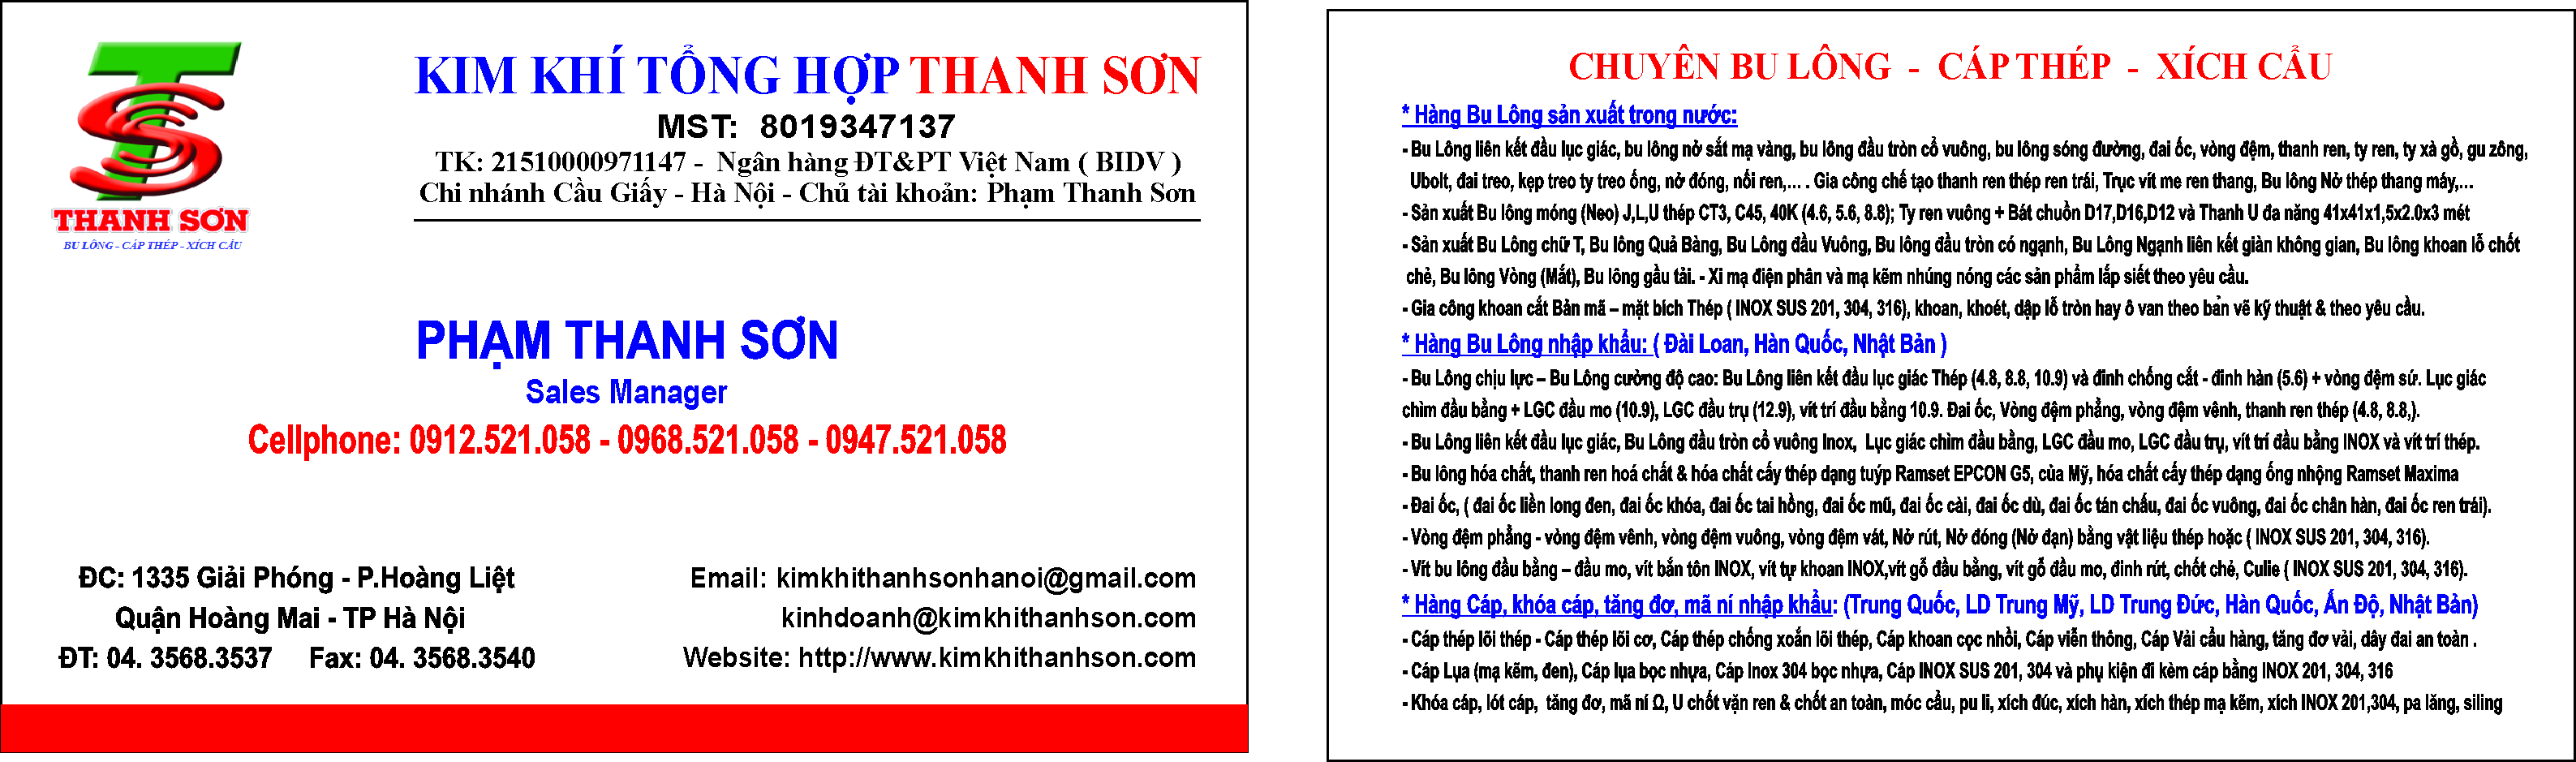 Card Thanh Sơn 12.07.2016 OK